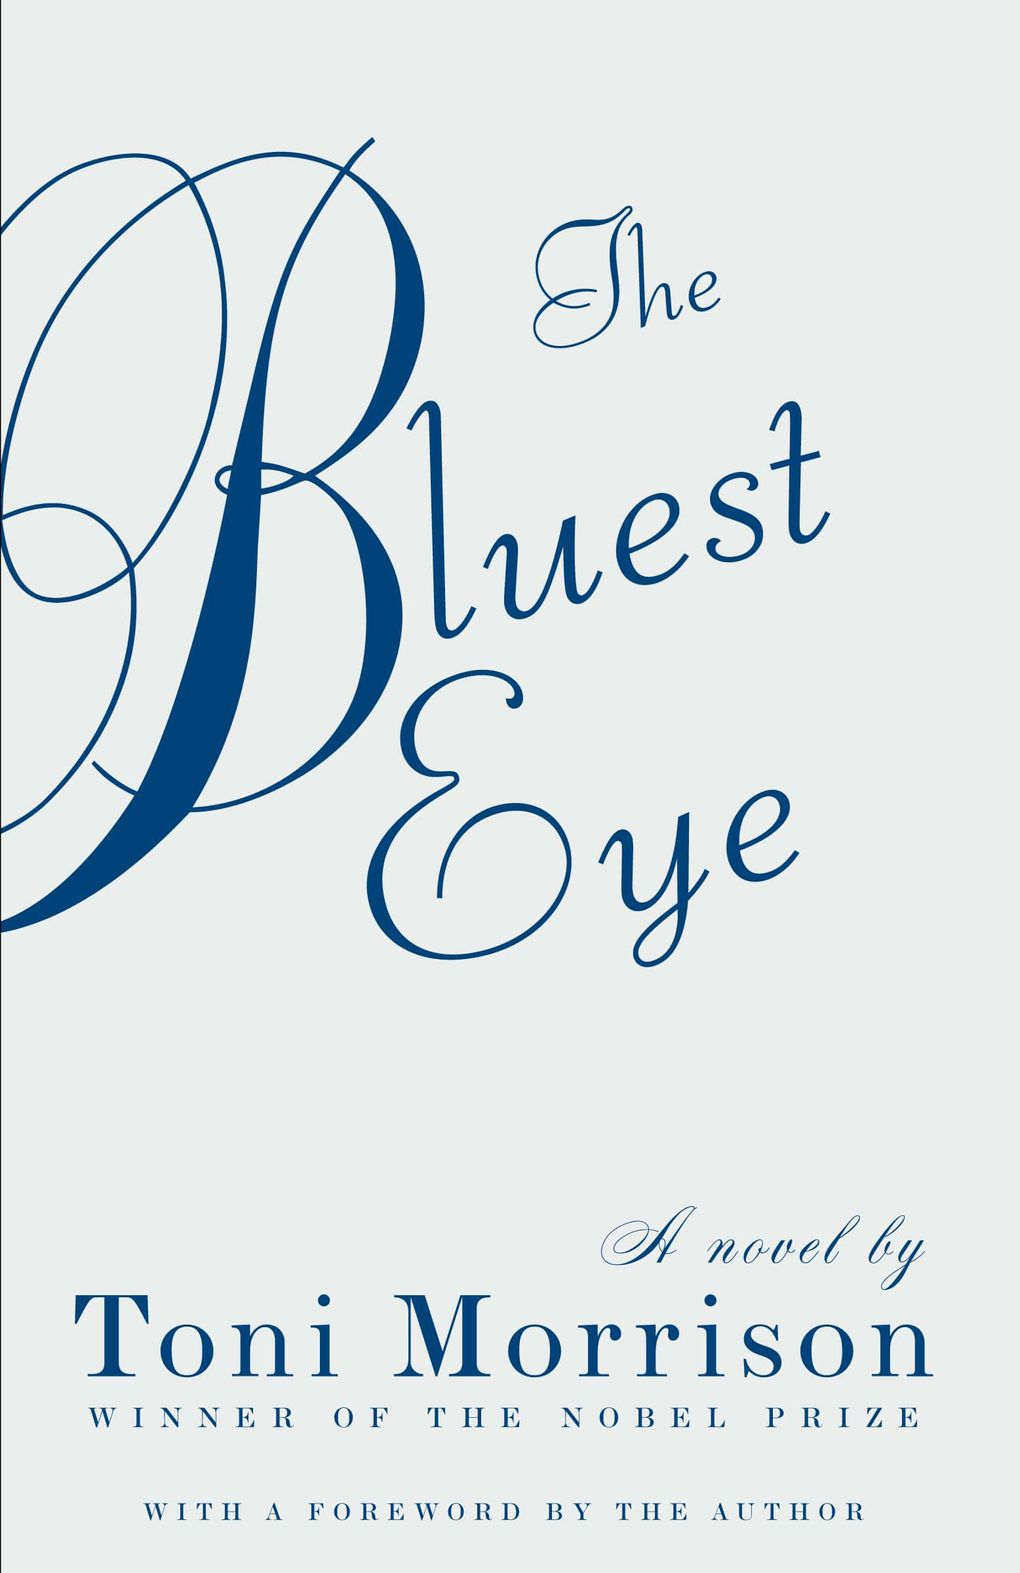 """The Bluest Eye"" was published in 1970, when Toni Morrison was 39."